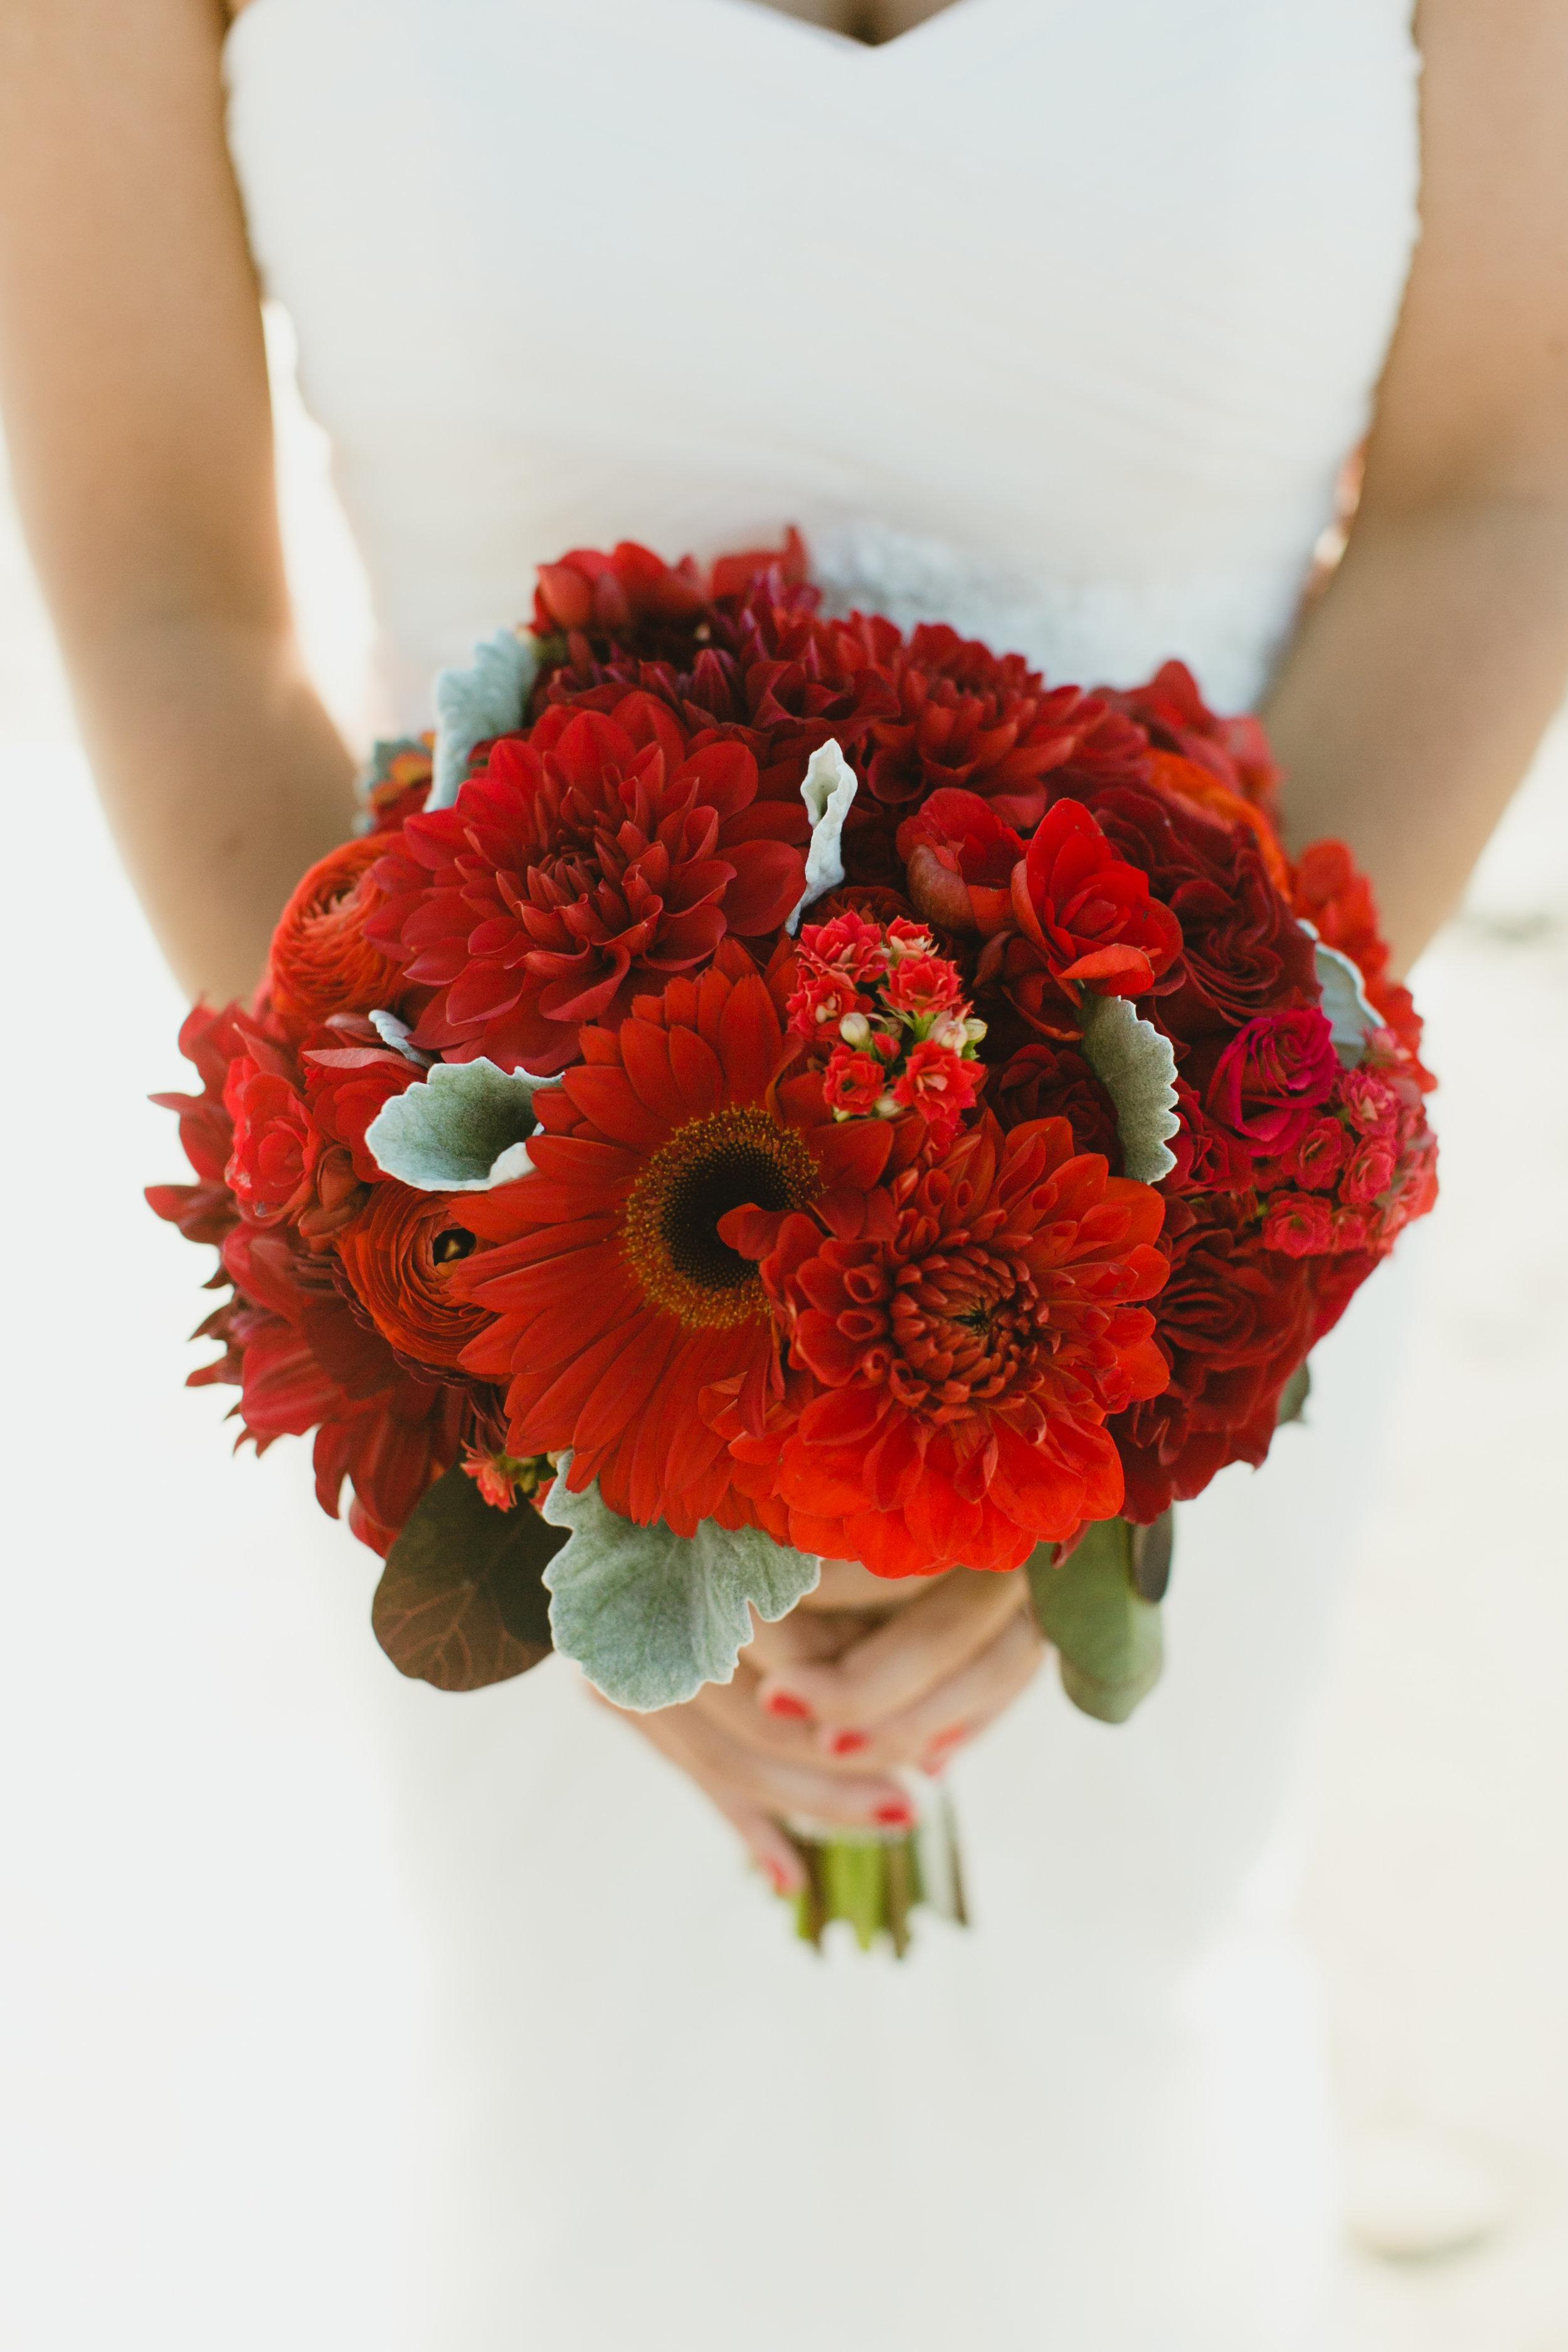 Bridal Bouquet in Rich Deep Reds